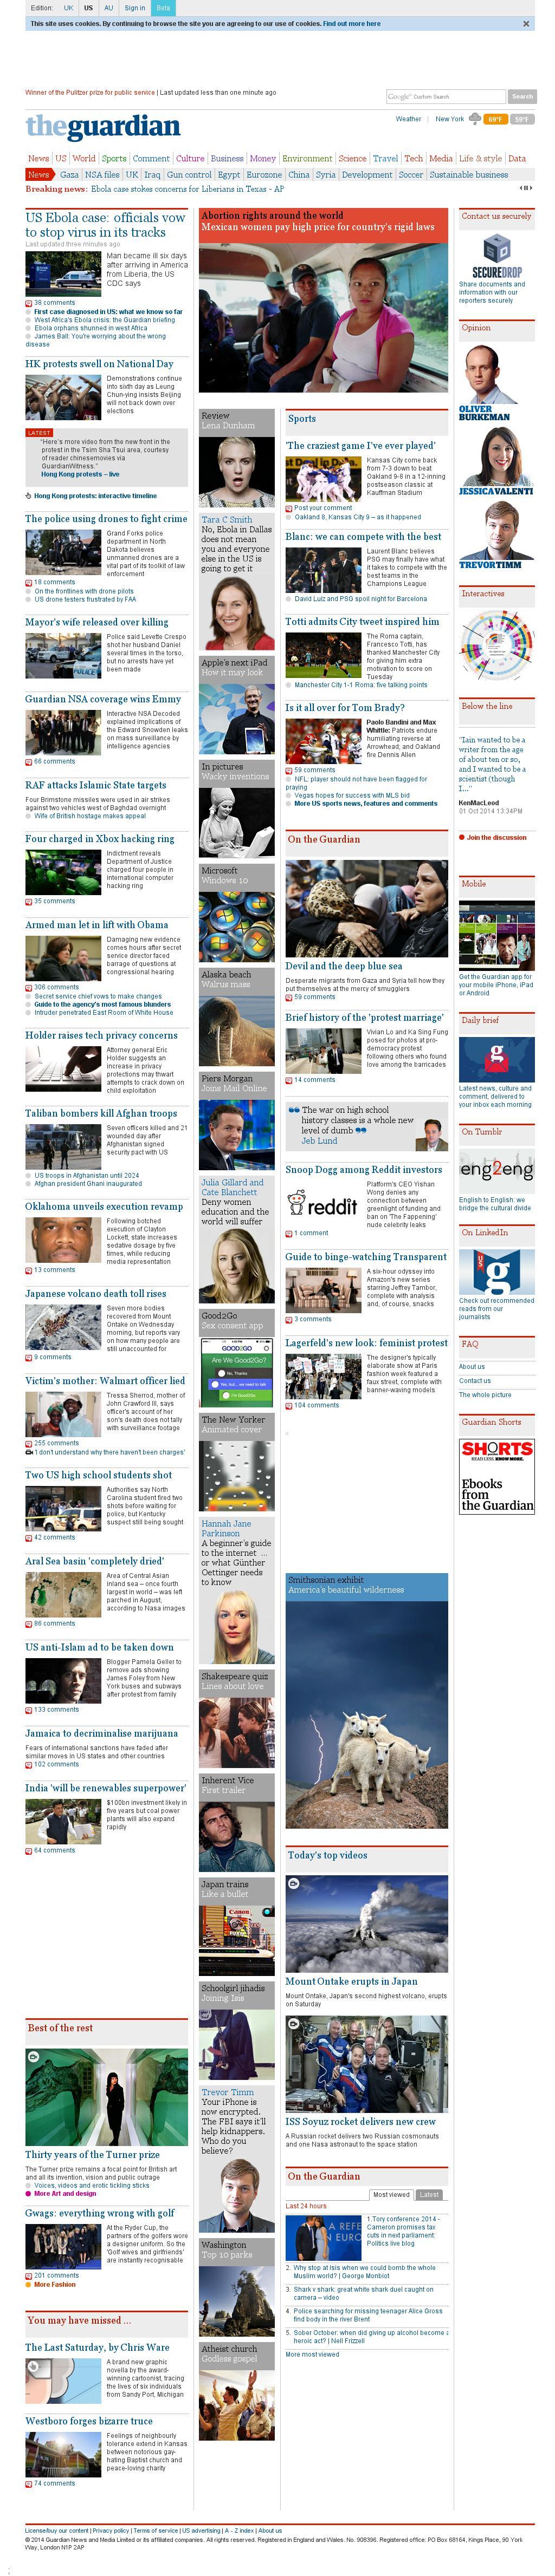 The Guardian at Wednesday Oct. 1, 2014, 1:07 p.m. UTC